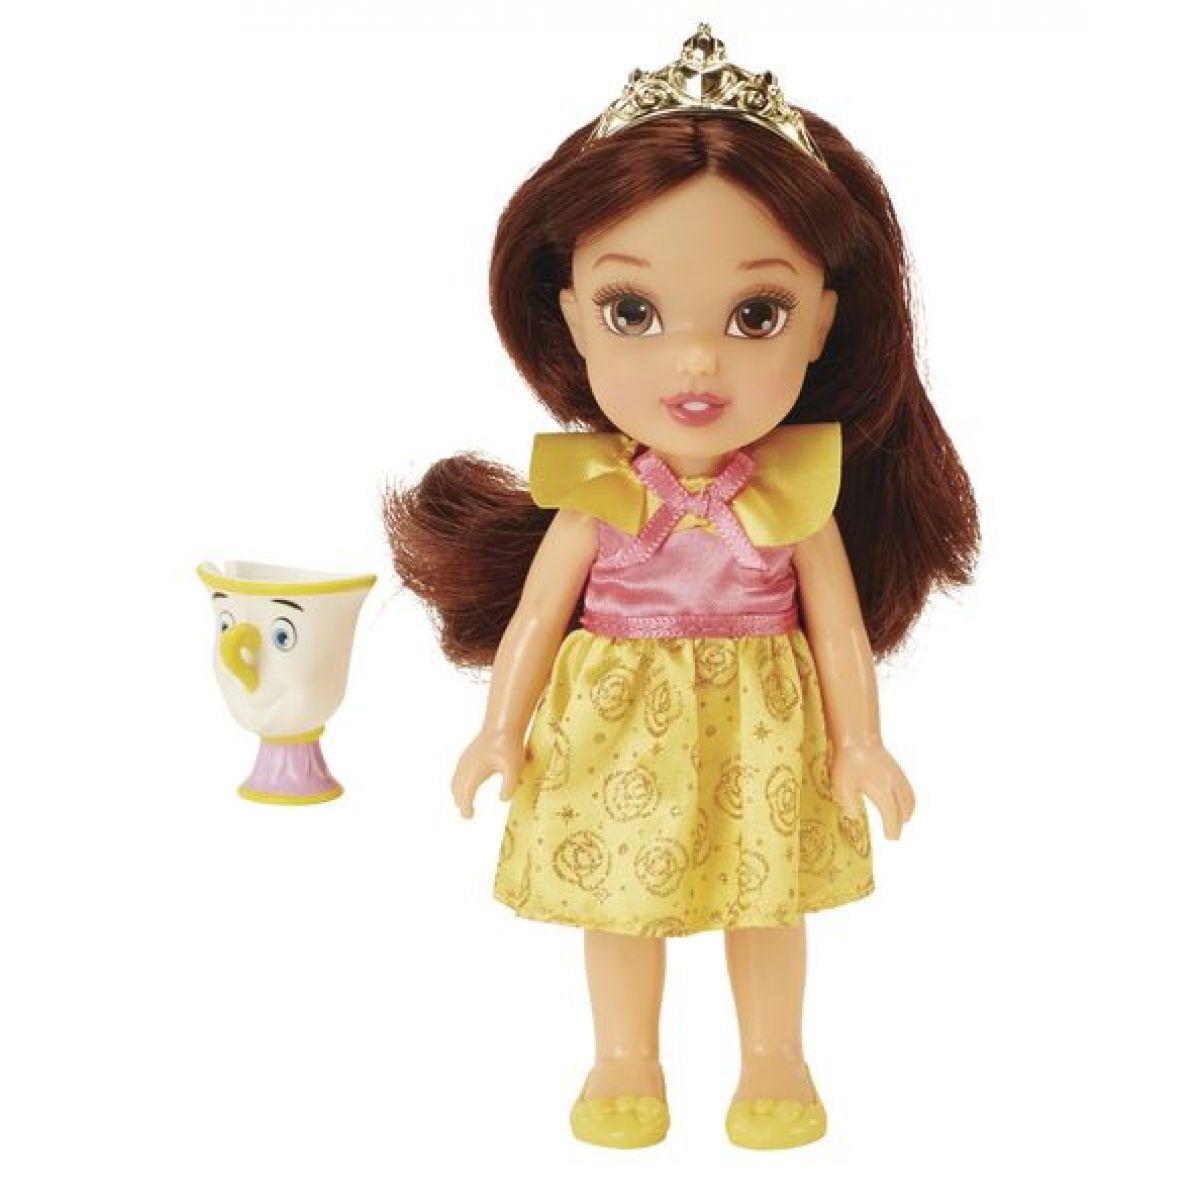 ADC Blackfire Disney Princess Princezna Bella 15 cm a kamarád